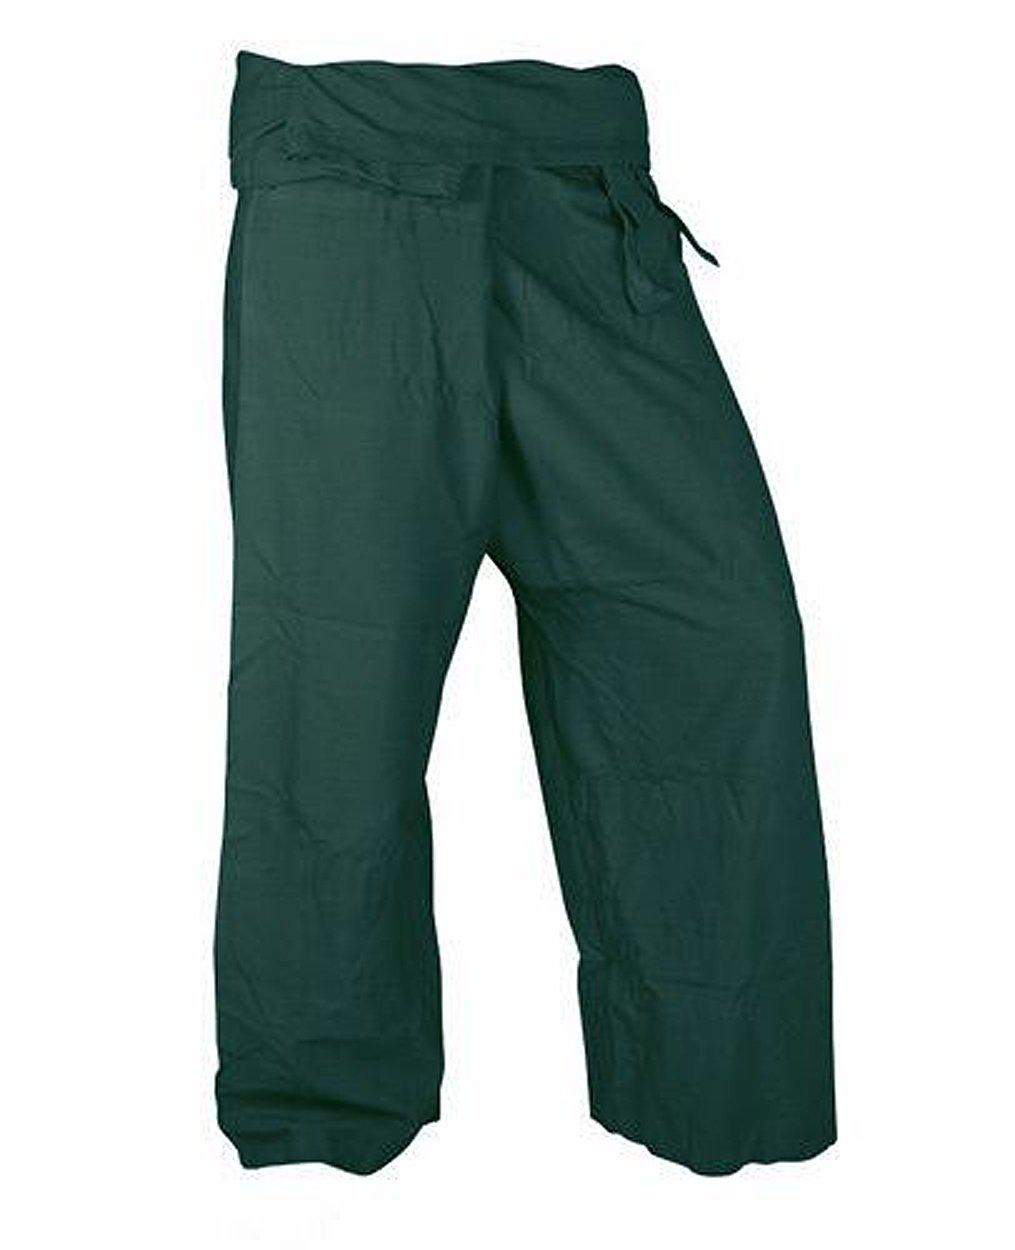 Muy suave rayón tela Yoga pantalones Thai Pescador ...